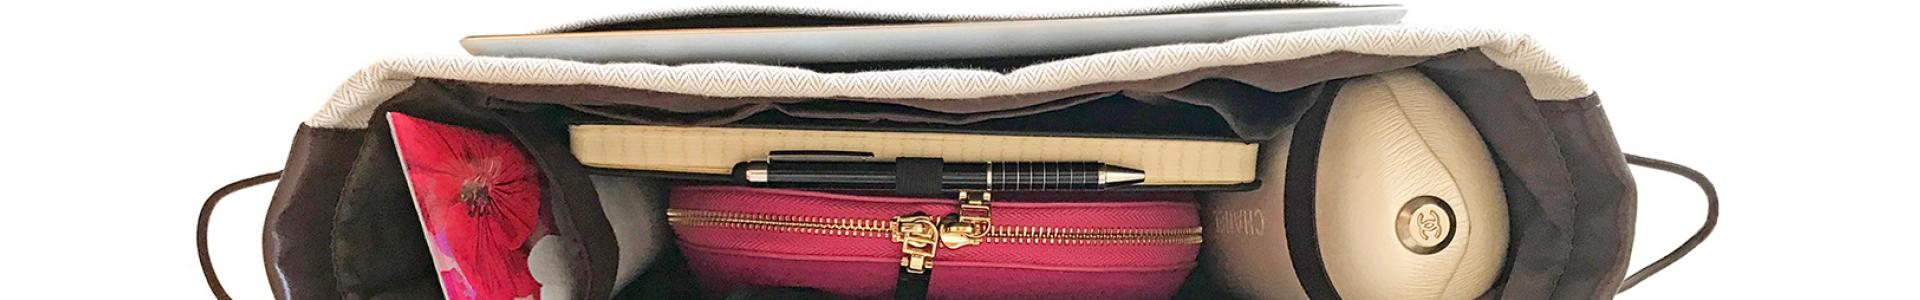 Handbag Organizers